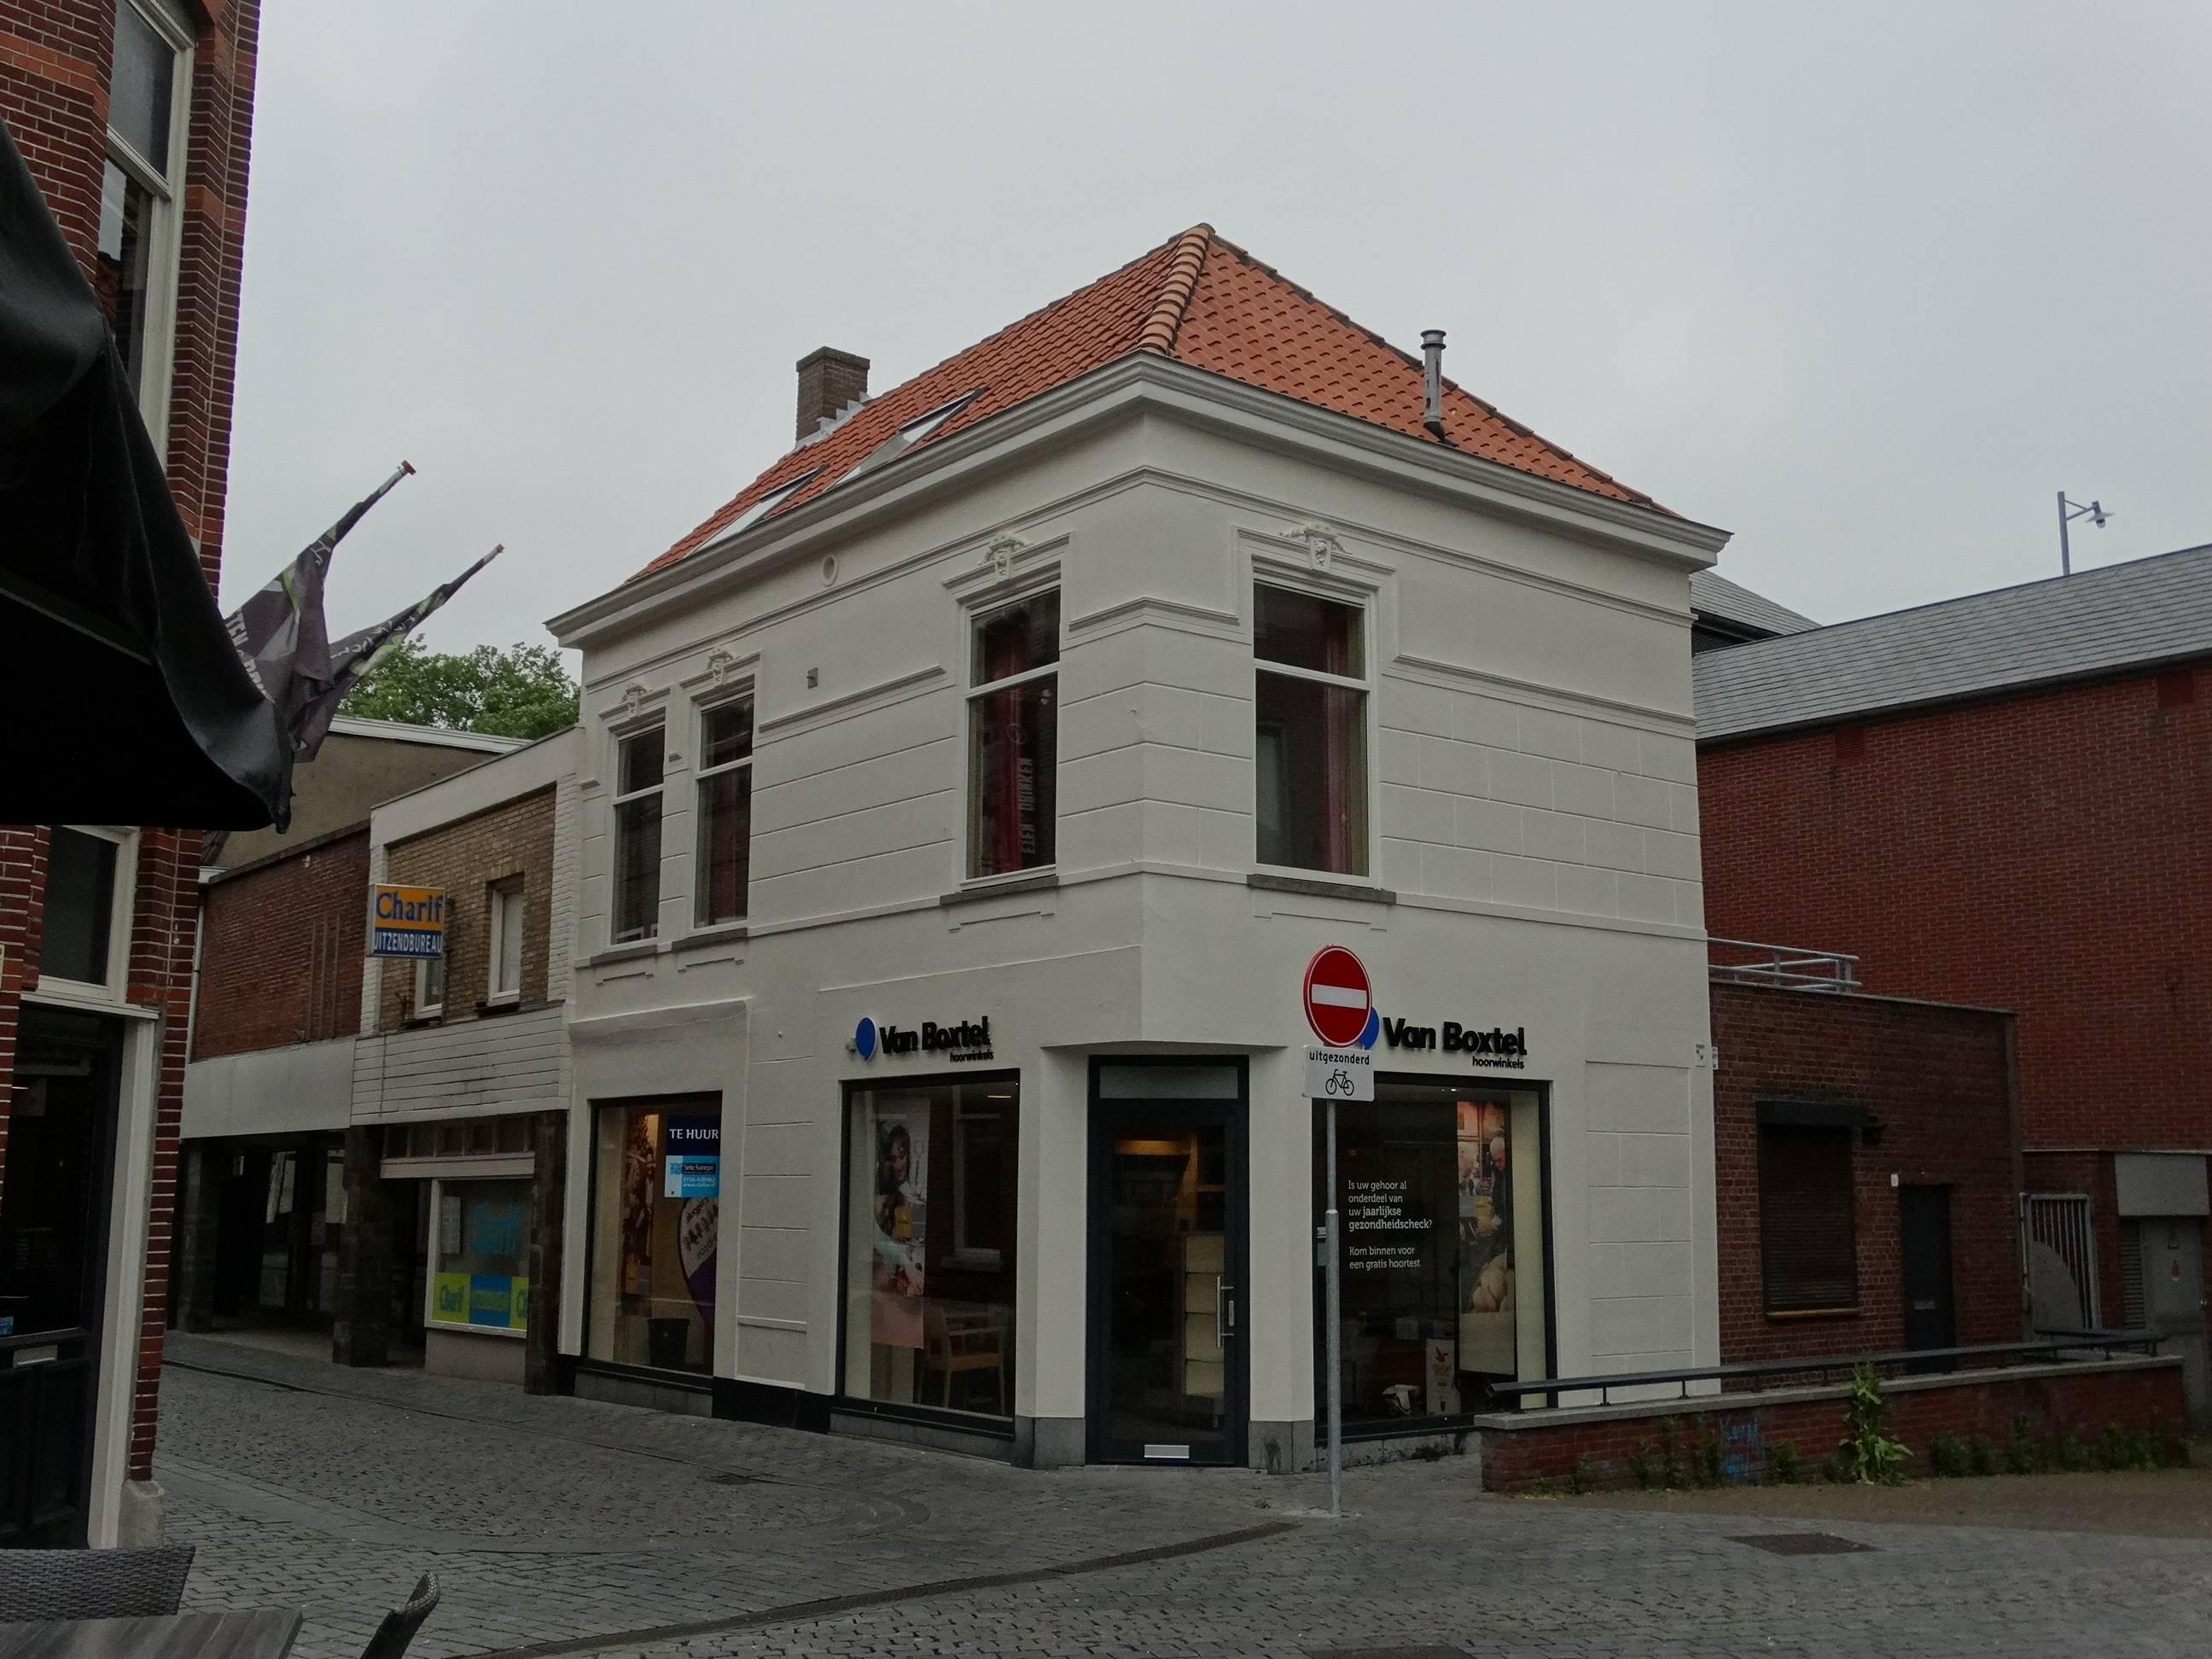 https://public.parariusoffice.nl/170/photos/huge/51679624.1529333489-368.JPG